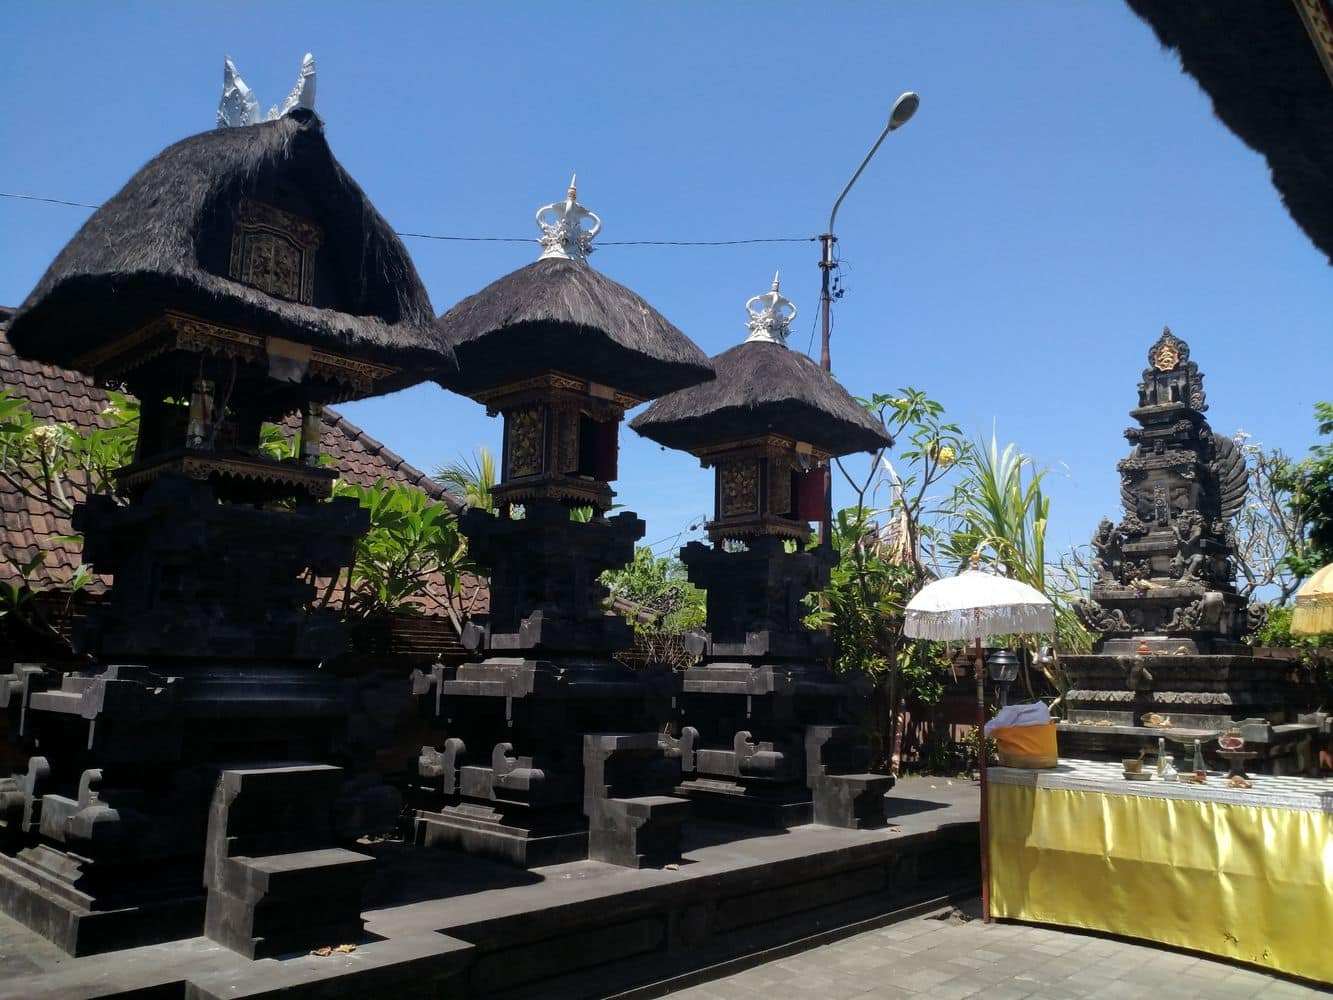 Petitenget Temple Kuta Bali Entry Fee Dress Code Pura 00011